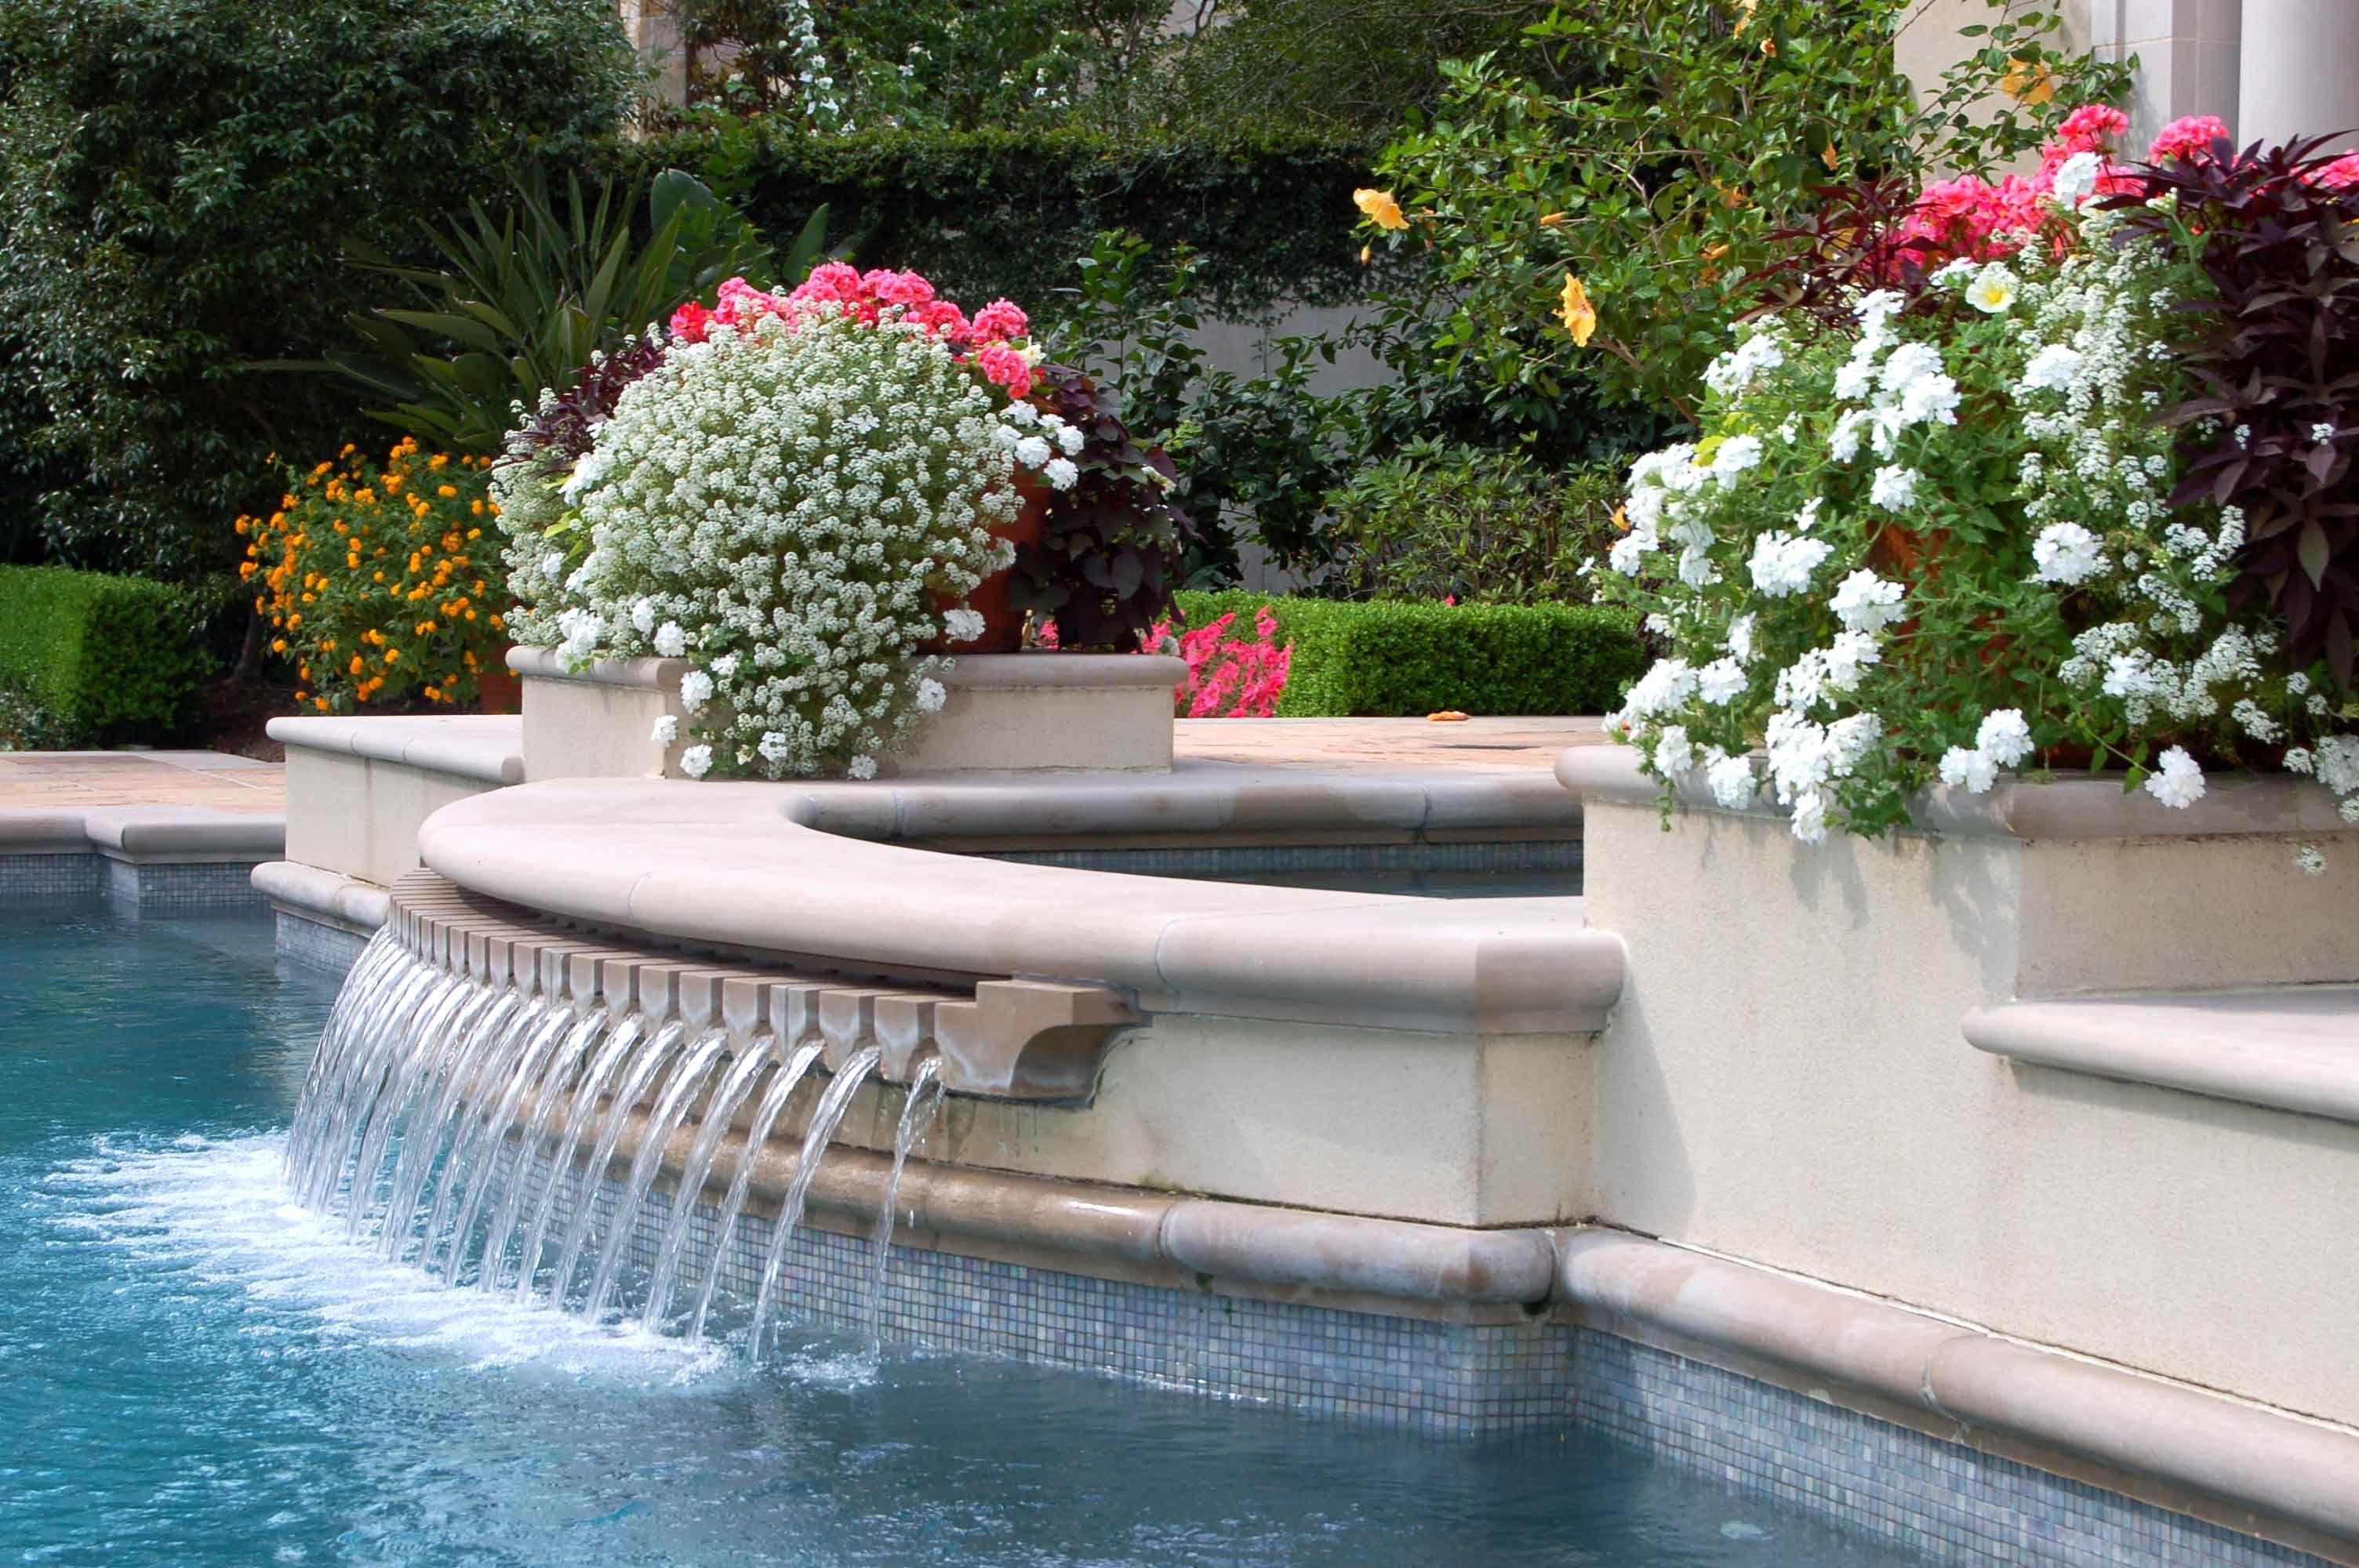 Spa Overflow Feature Mcdugald Steele Landscape Architects